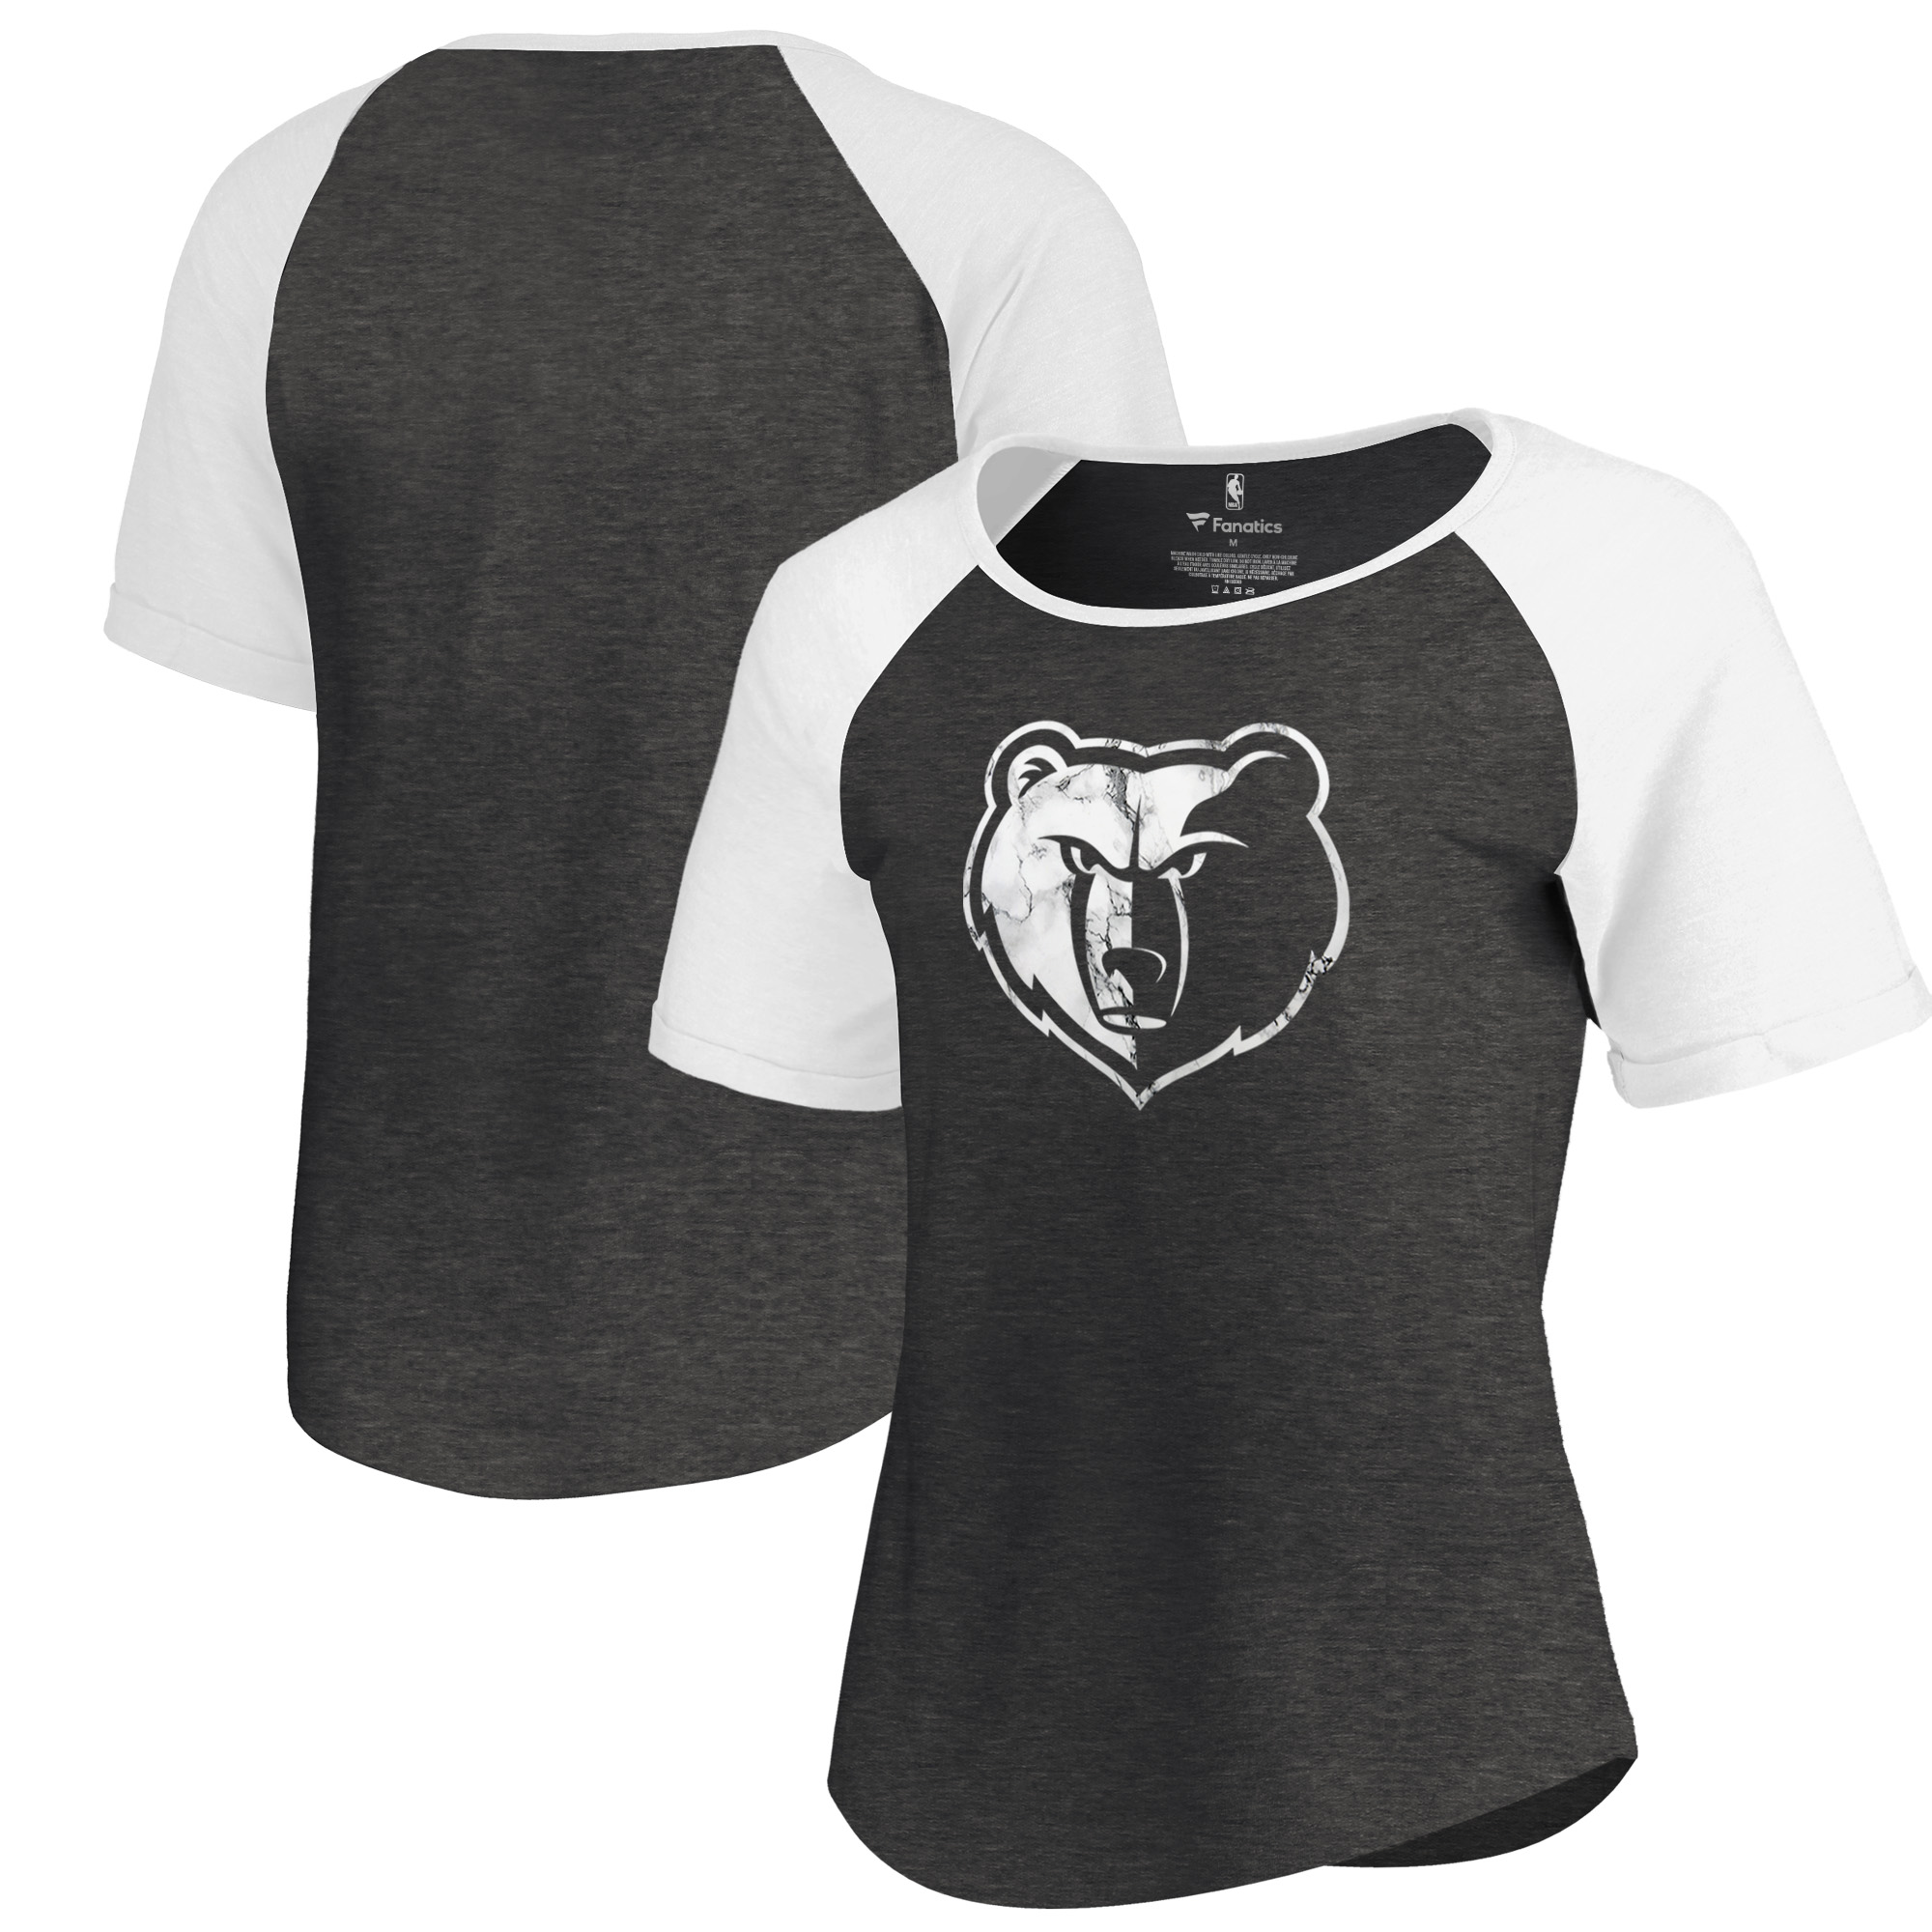 Memphis Grizzlies Fanatics Branded Women's Marble Logo Raglan T-Shirt - Black